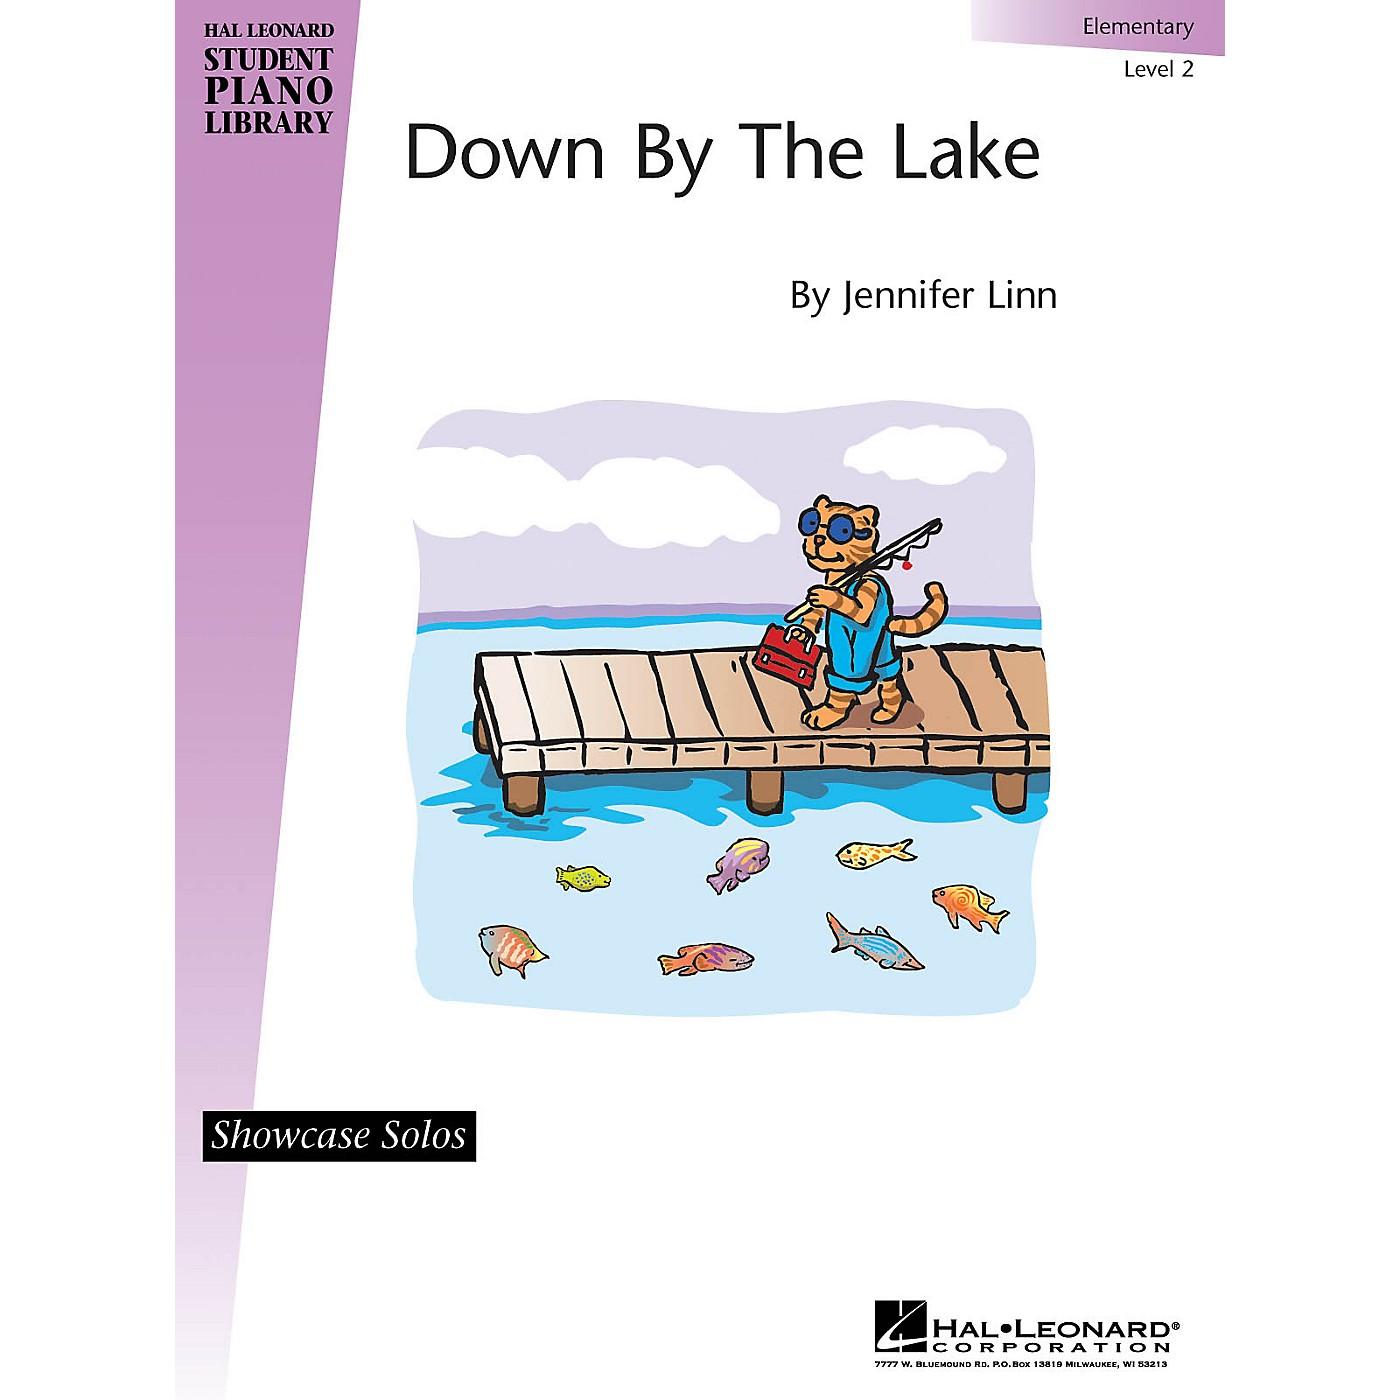 Hal Leonard Down By the Lake Piano Library Series Book by Jennifer Linn (Level Elem) thumbnail